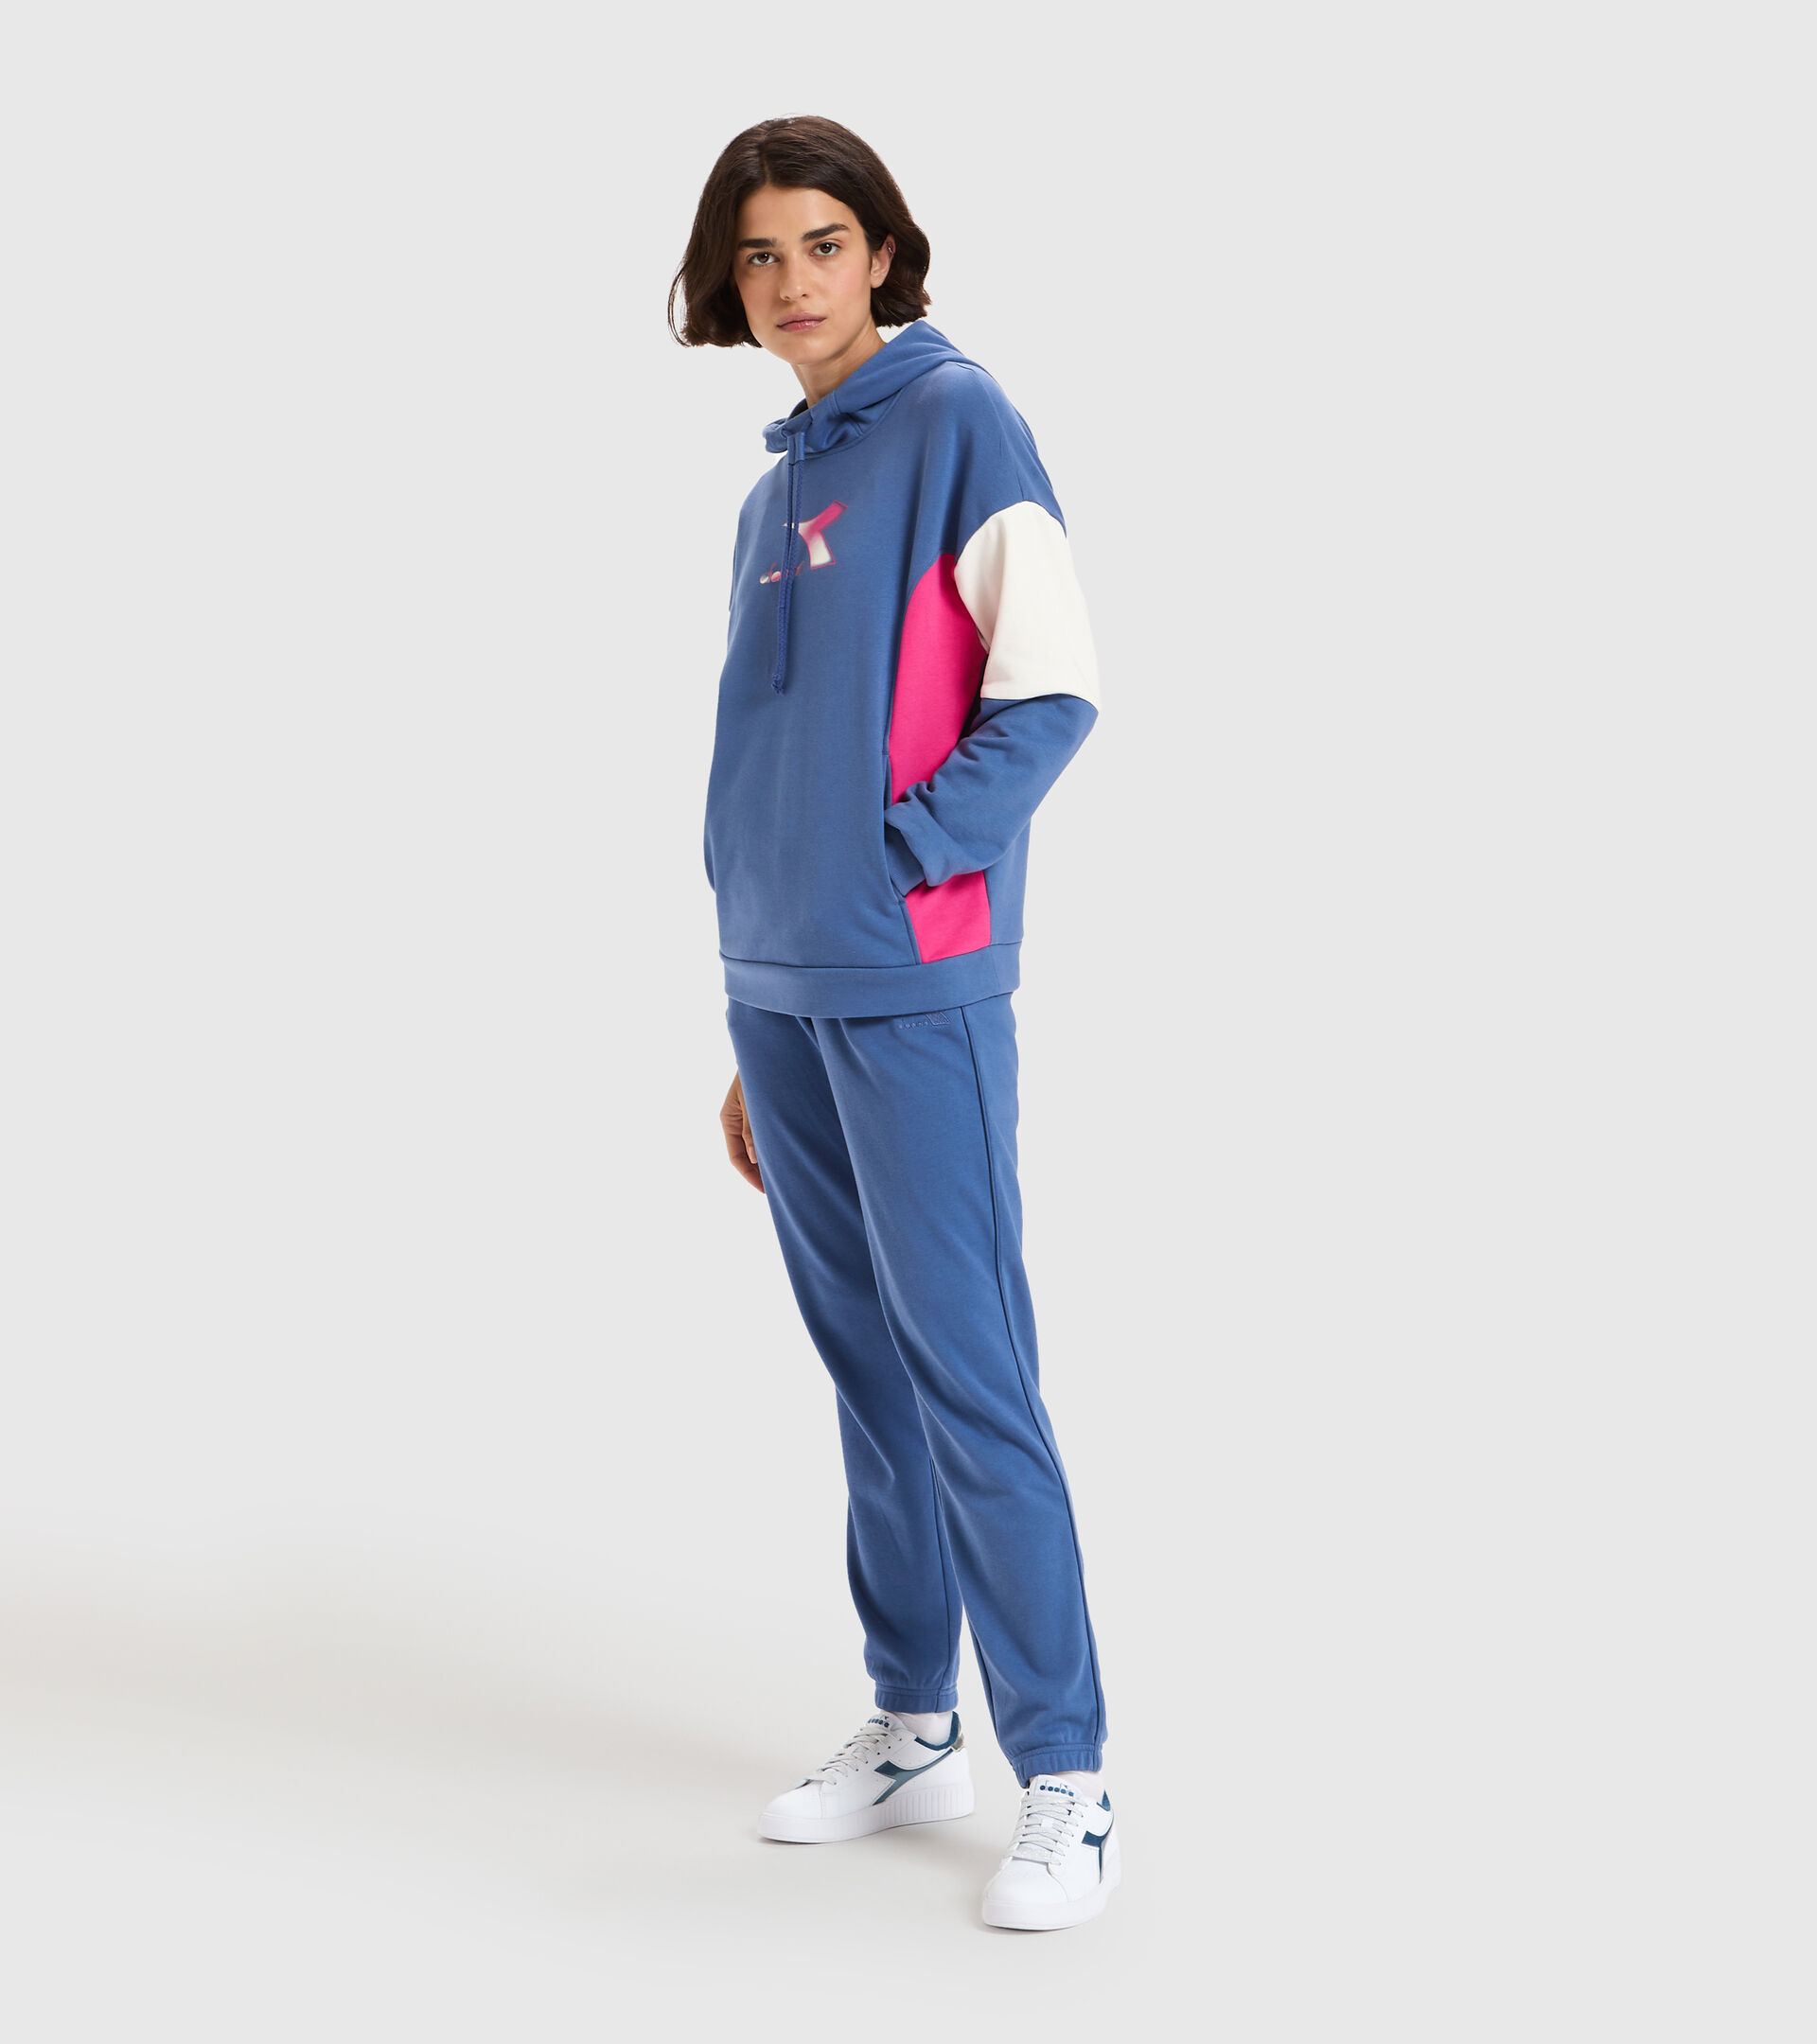 Hooded sweatshirt - Women L.HOODIE LUSH BIJOU BLUE - Diadora